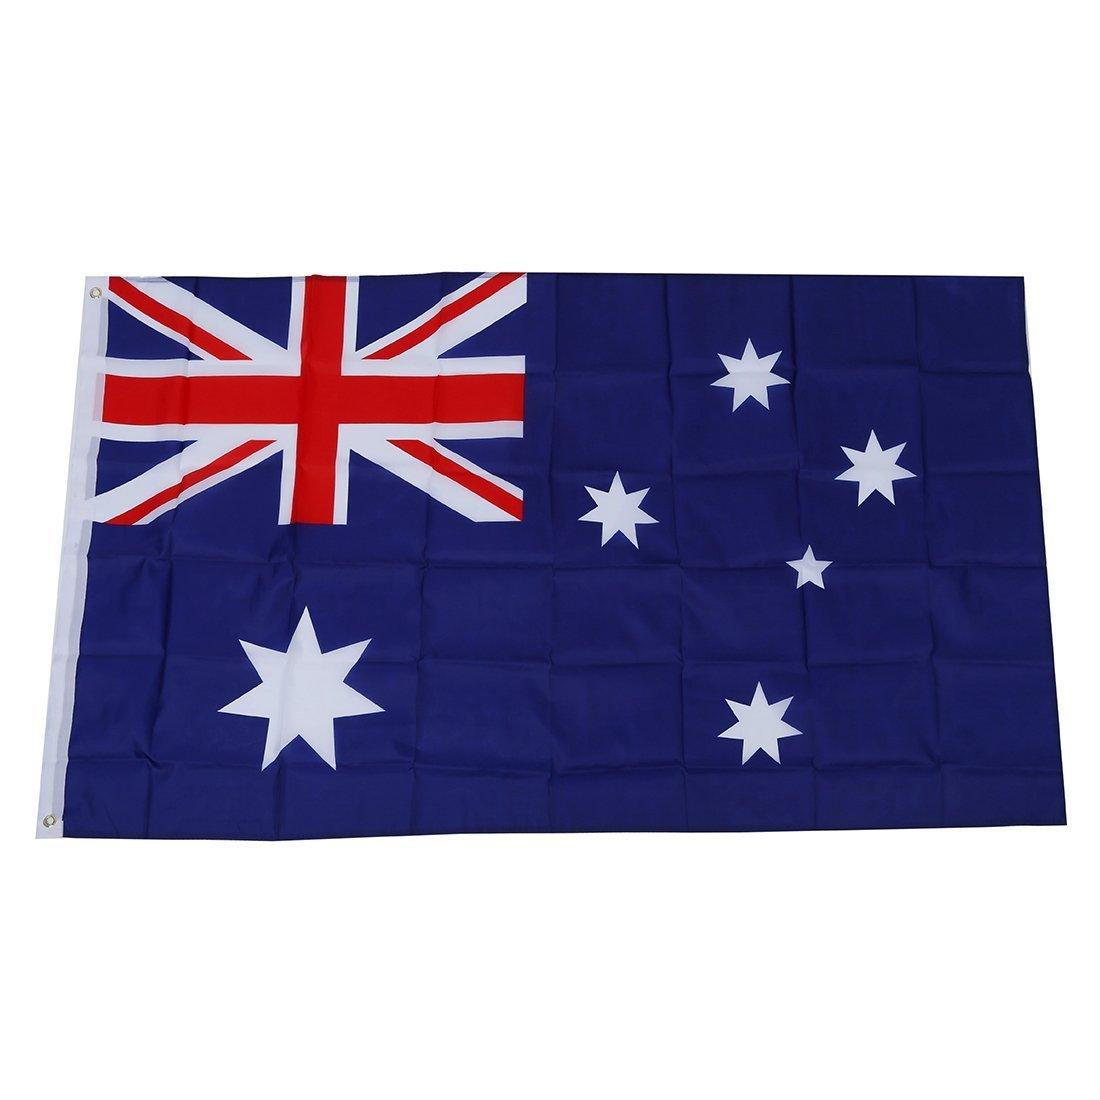 TOOGOO (R) Grande 90x150cm 5 X 3FT tifosi Olimpiadi National Sports bandiere con passacavo - bandiera australiana